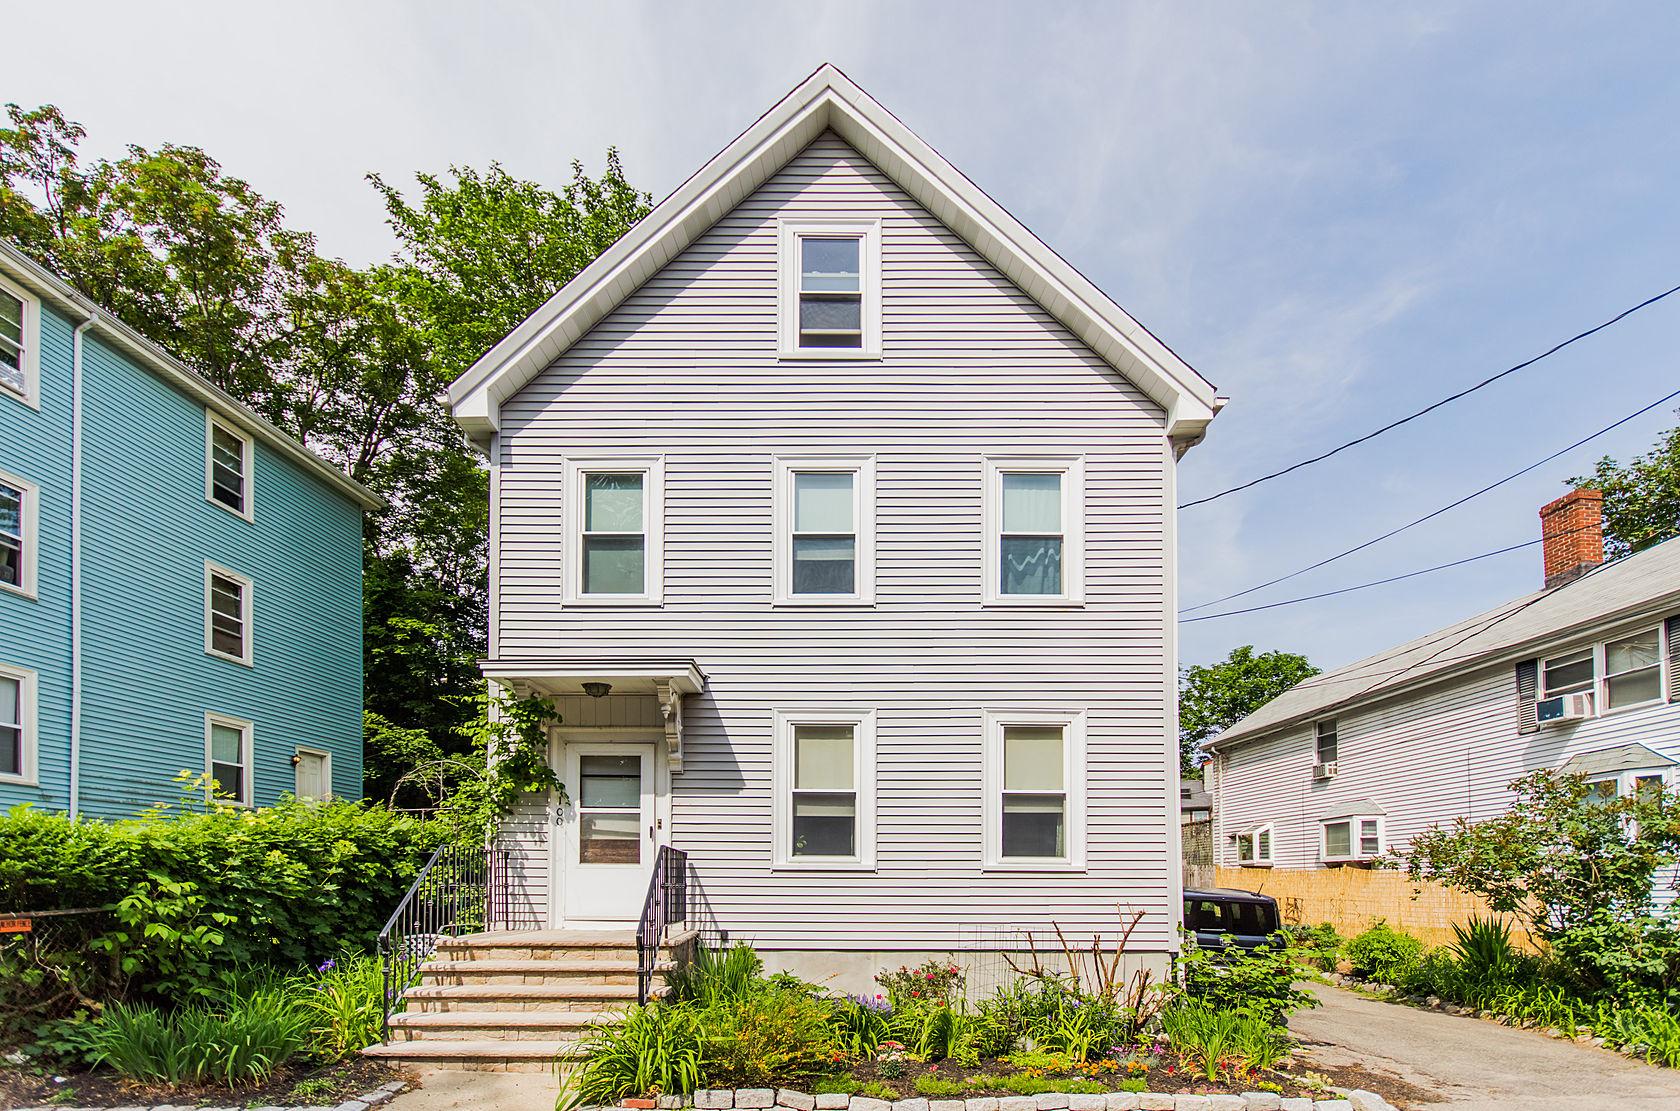 Multi-Family Home for Sale at 100 Jamaica Street Boston, Massachusetts 02130 United States